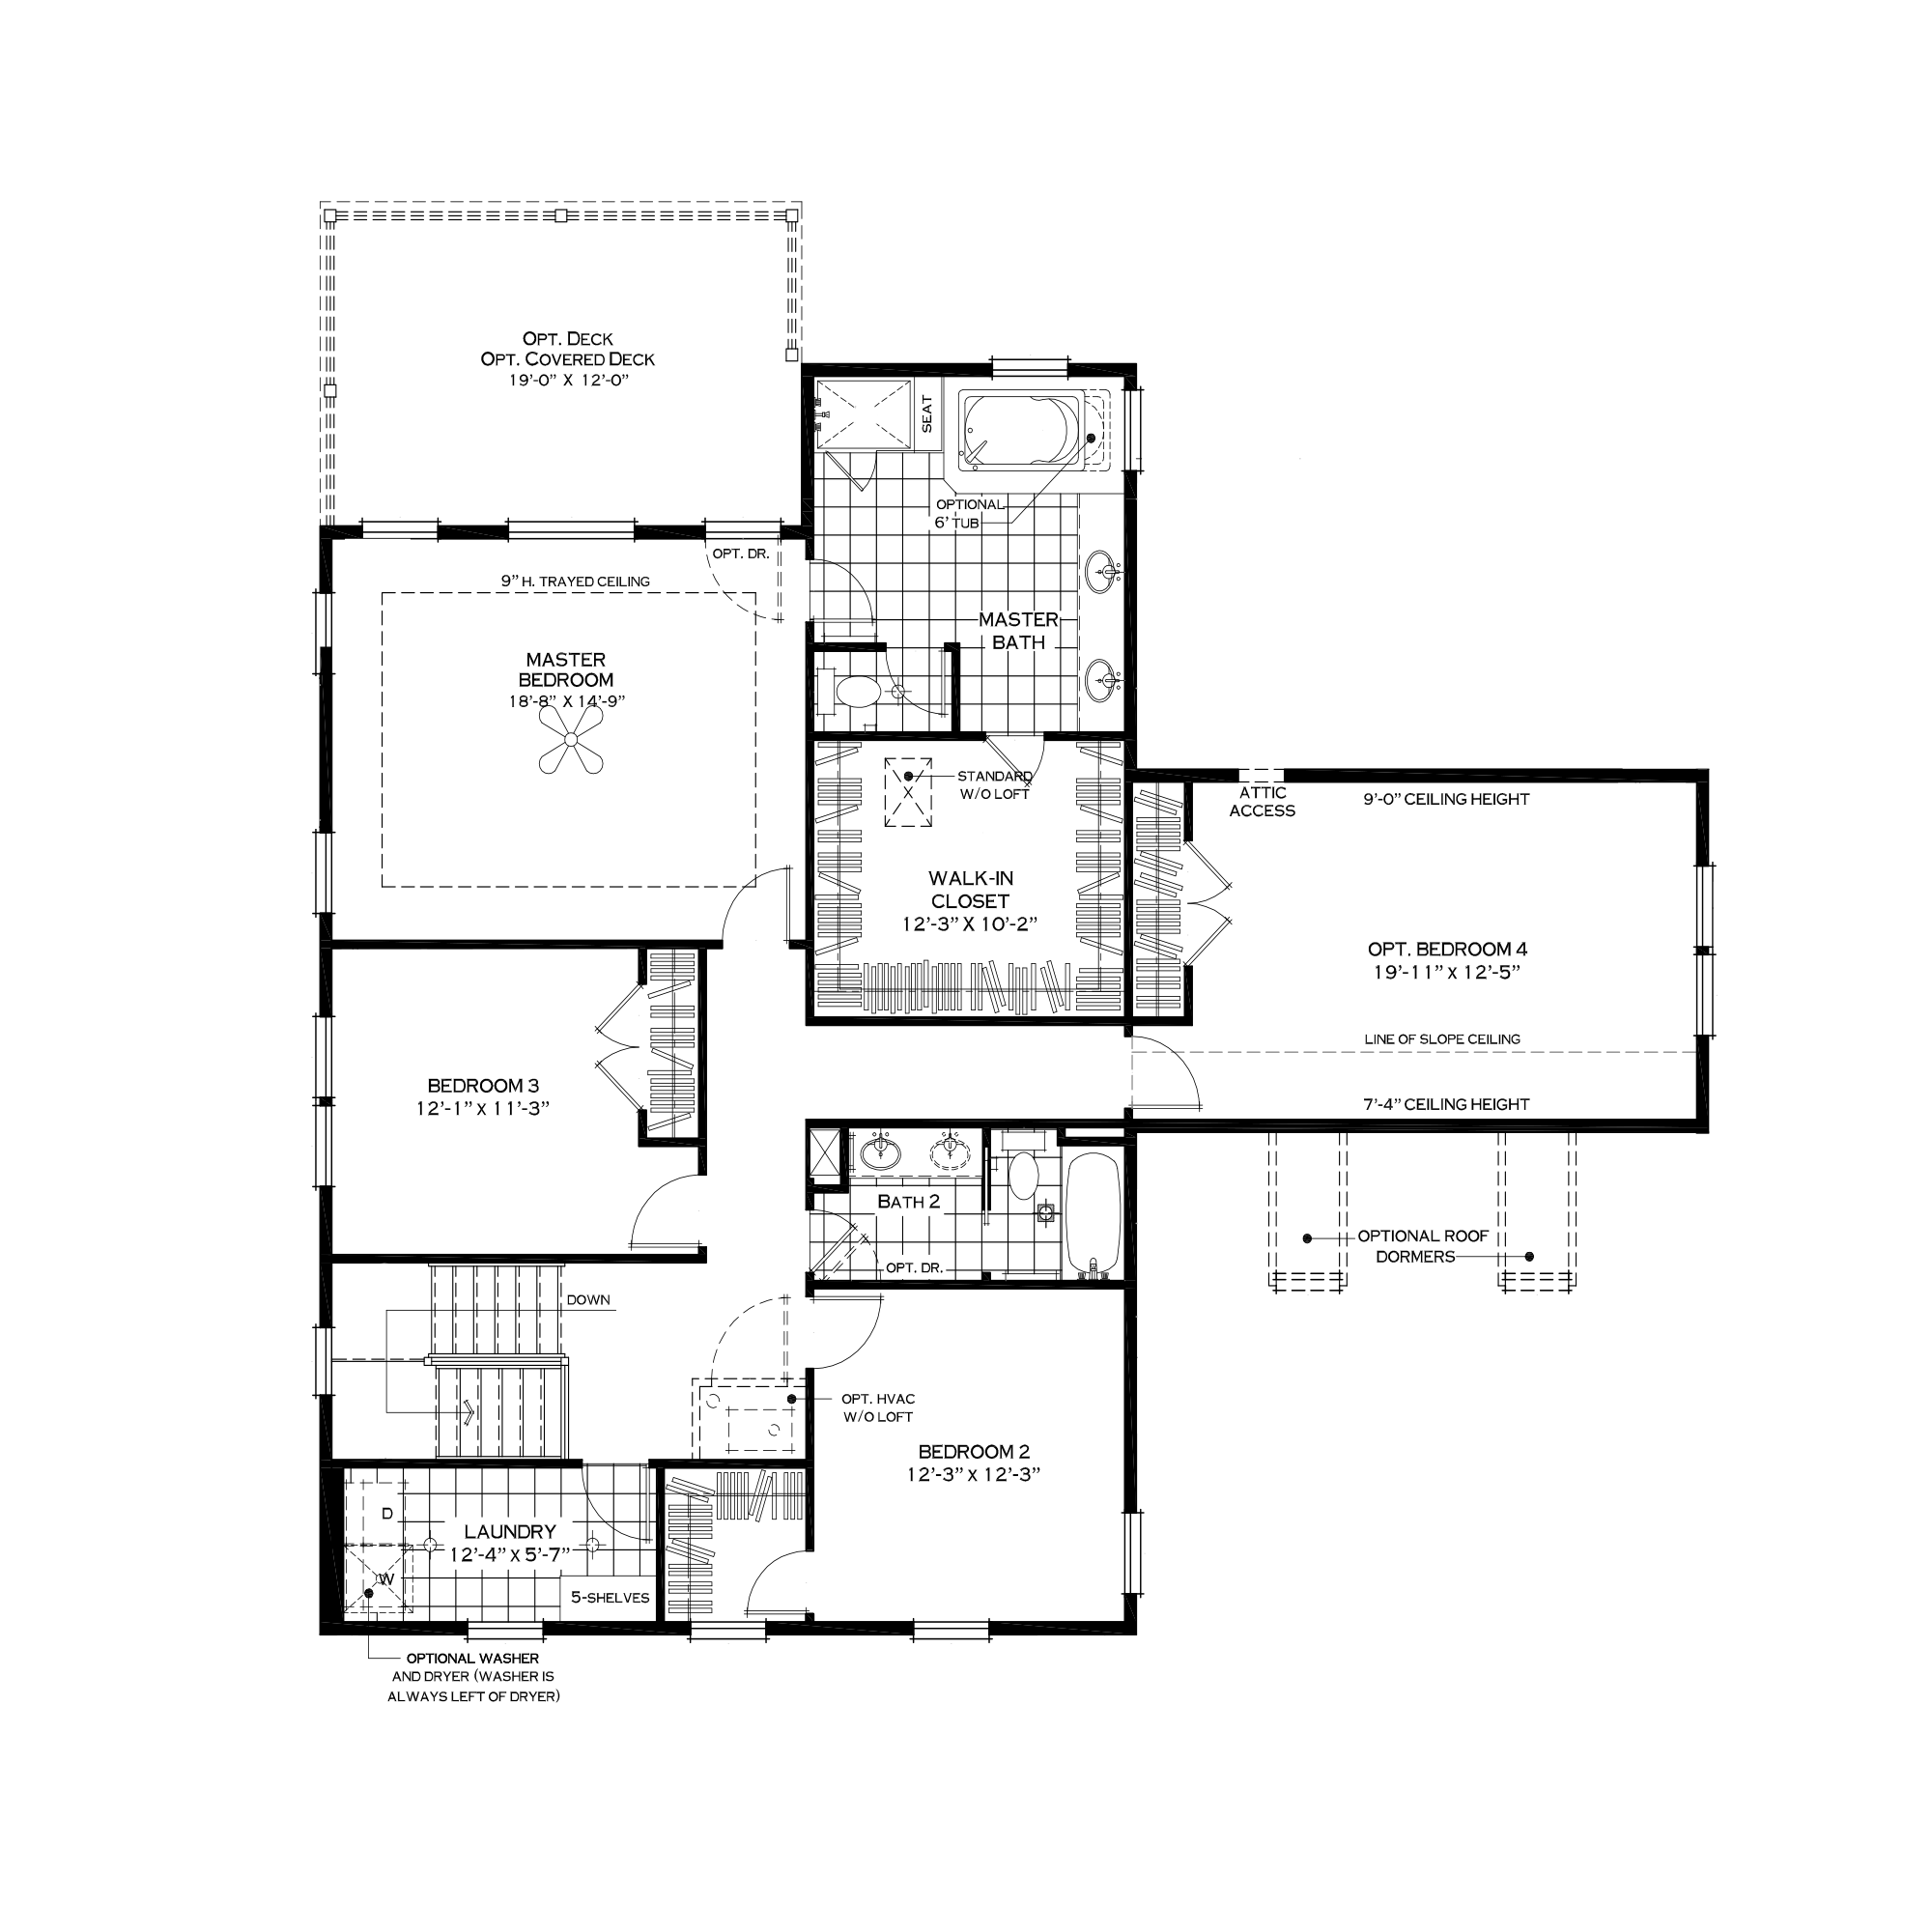 Second Floor with Garage Loft Option